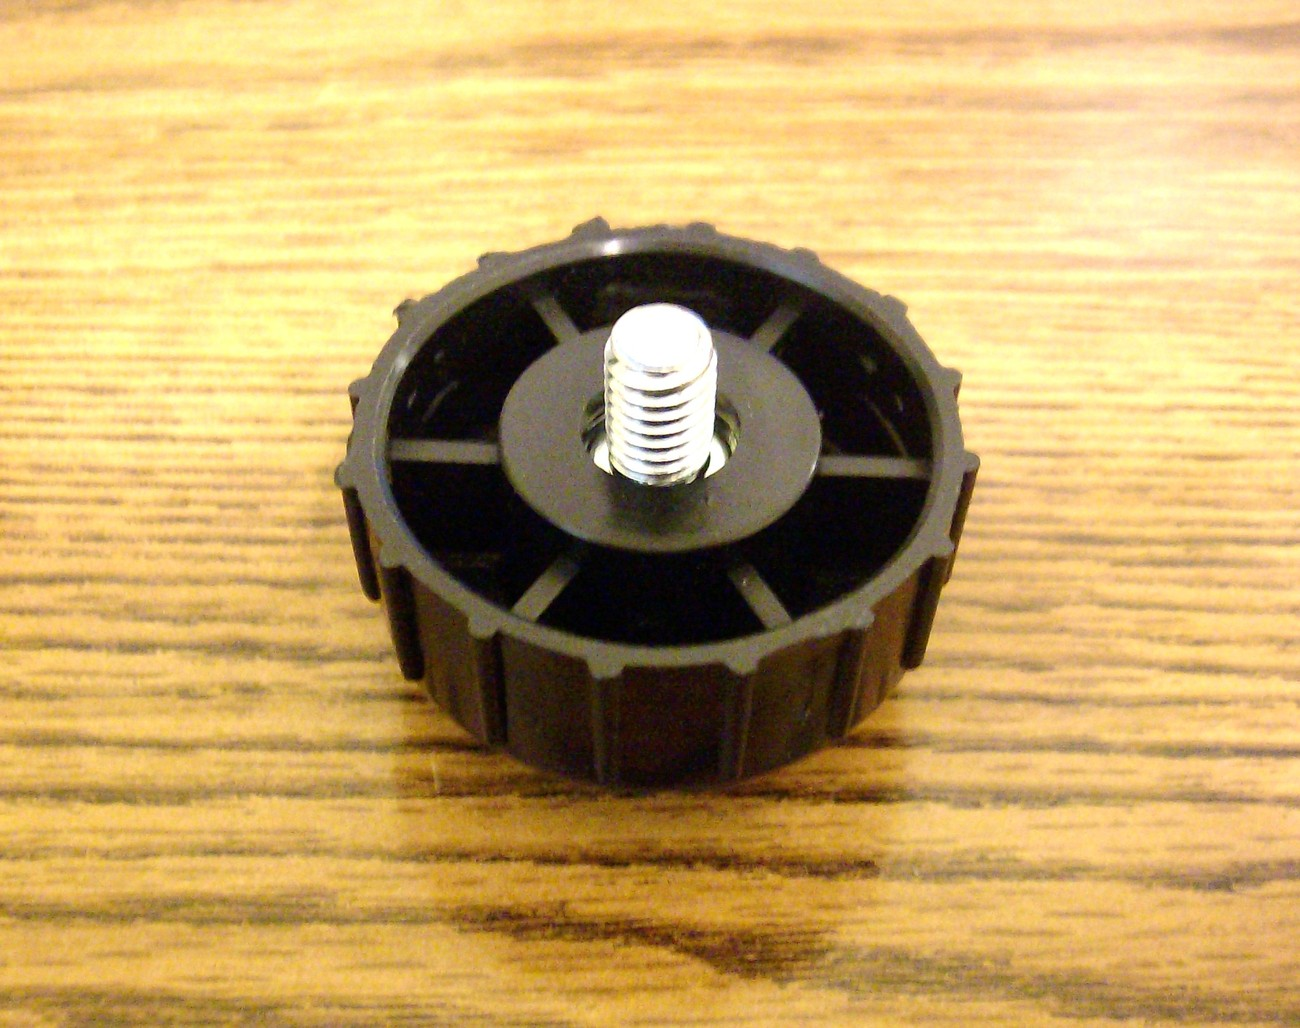 Bump head knob for Homelite, MCculloch, John Deere 308042002 / 300736 / UP06763